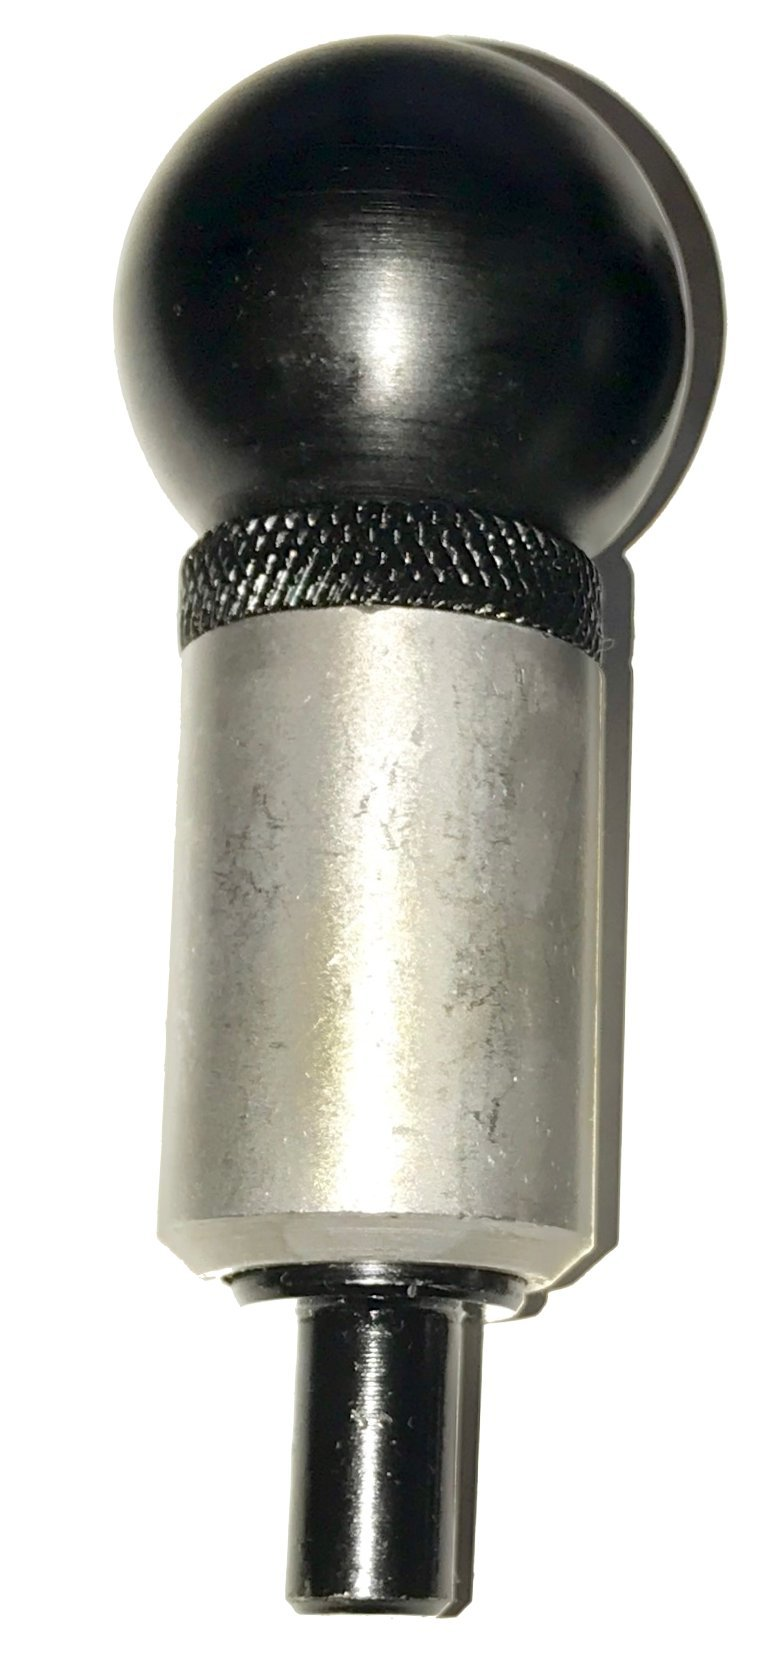 SBDs (Qty 4) 3/8'' Diameter) 'POP' Pull Pin 1'' Diameter x 1-1/2'' Length Weld ON Steel Barrel | Spring Loaded Zinc Plated Steel Plunger | Plastic Round Knob | Knurled Lock Nut.